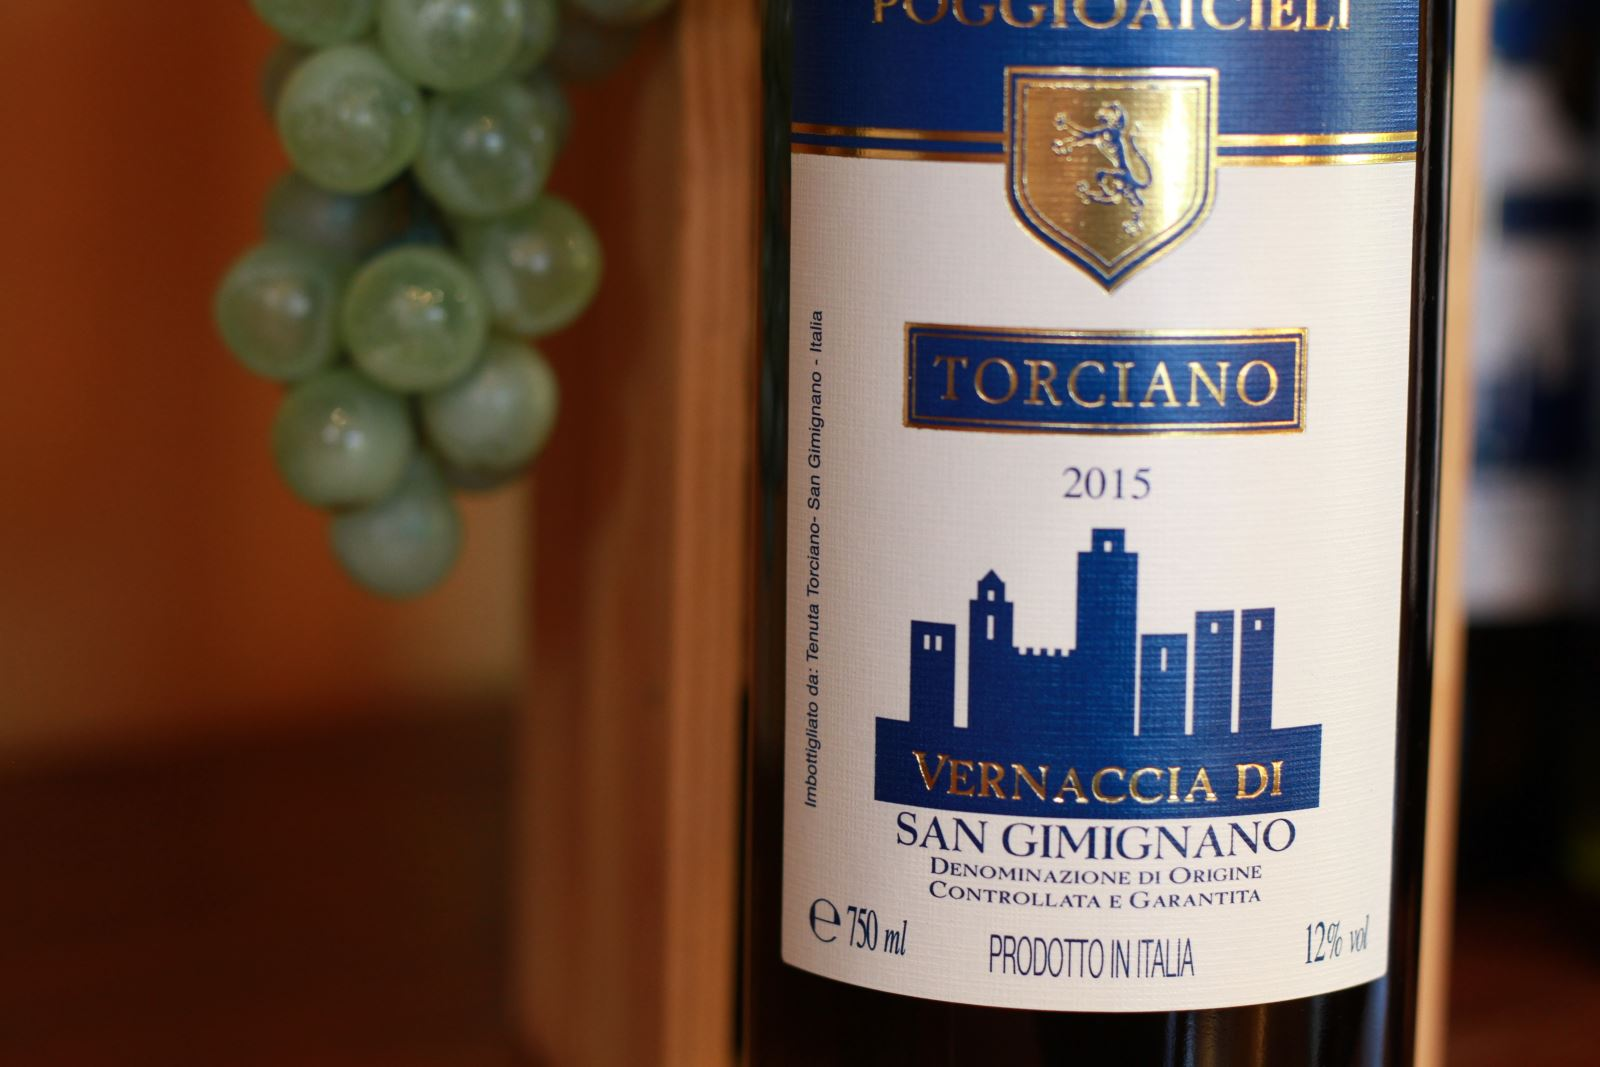 The Vernaccia of San Gimignano D.O.C.G. and its pairing